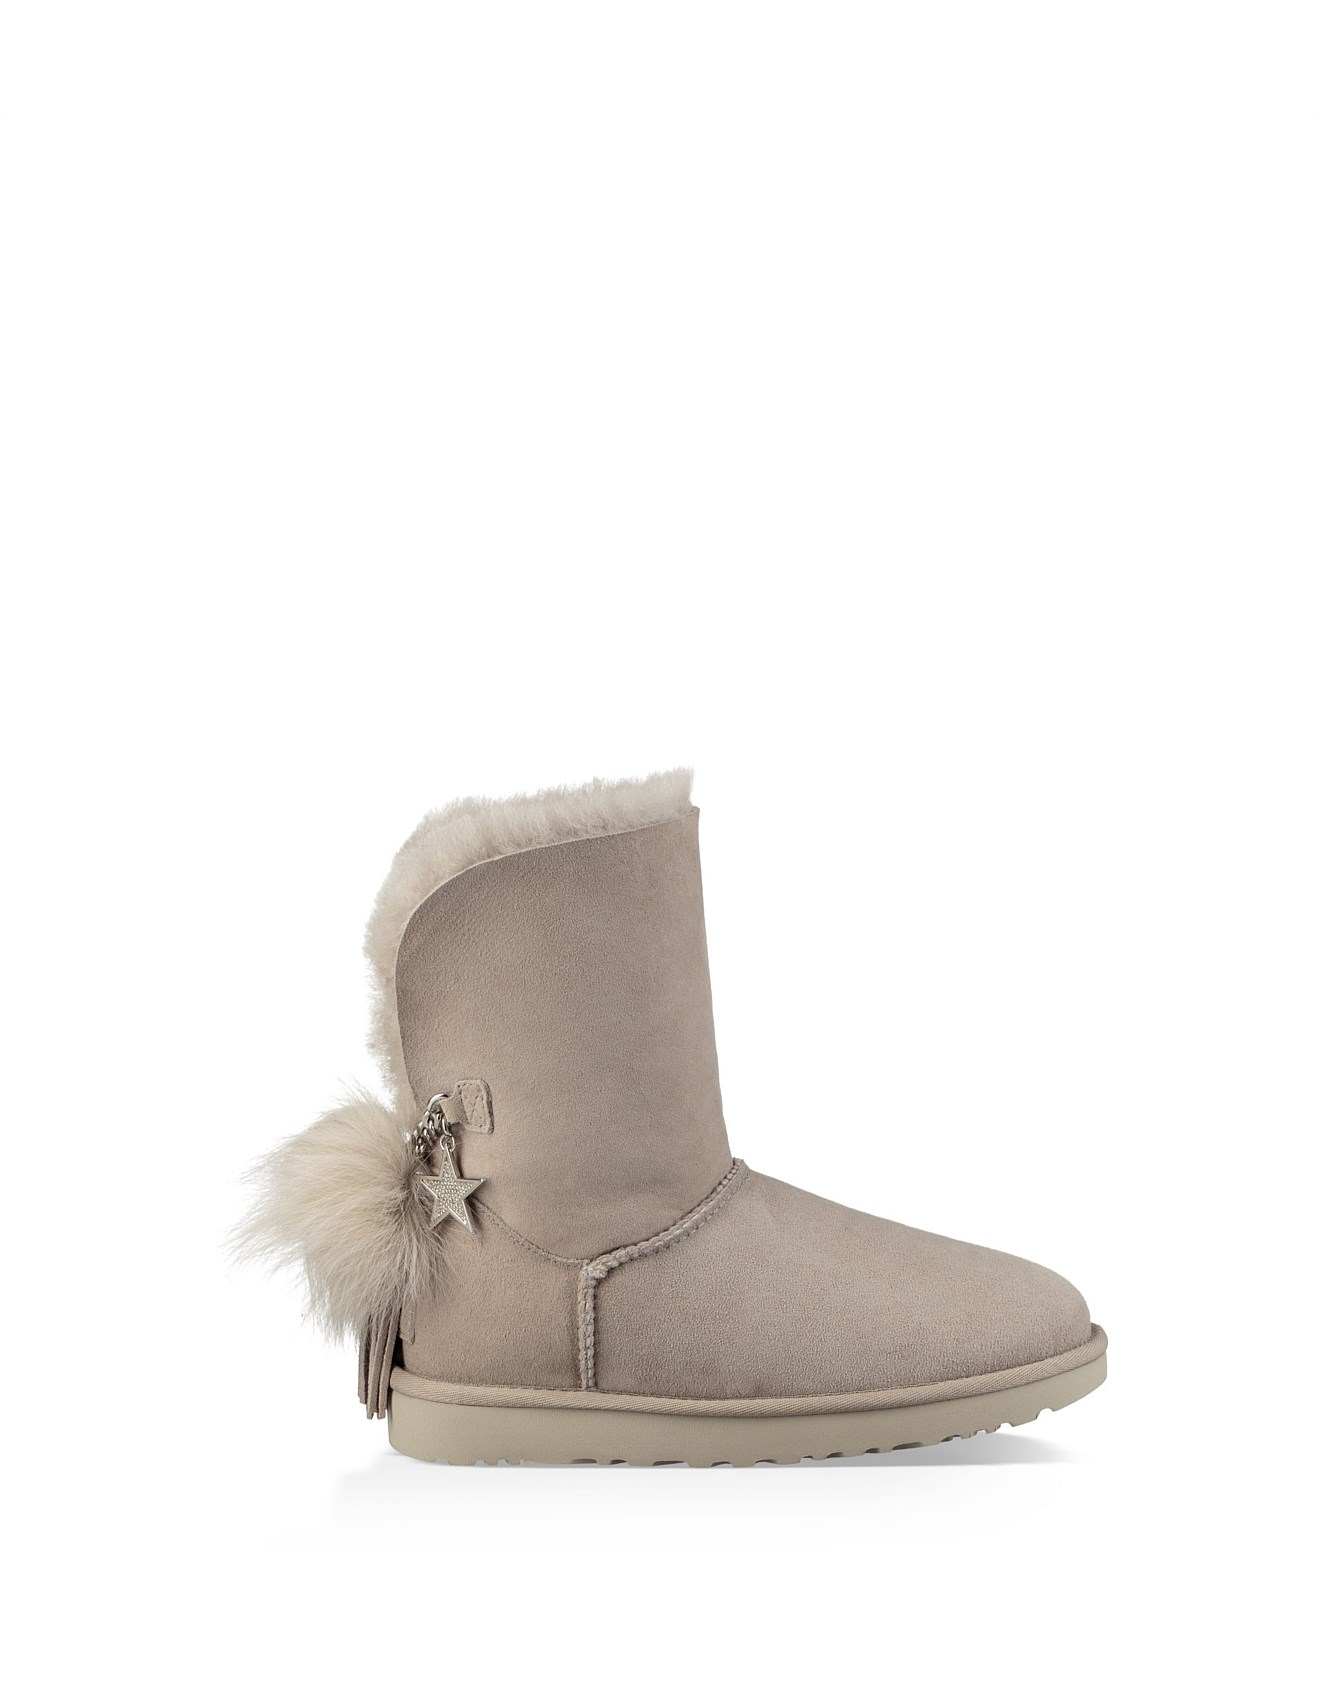 51b5751b16e coupon code purchase ugg boots 67747 184e9